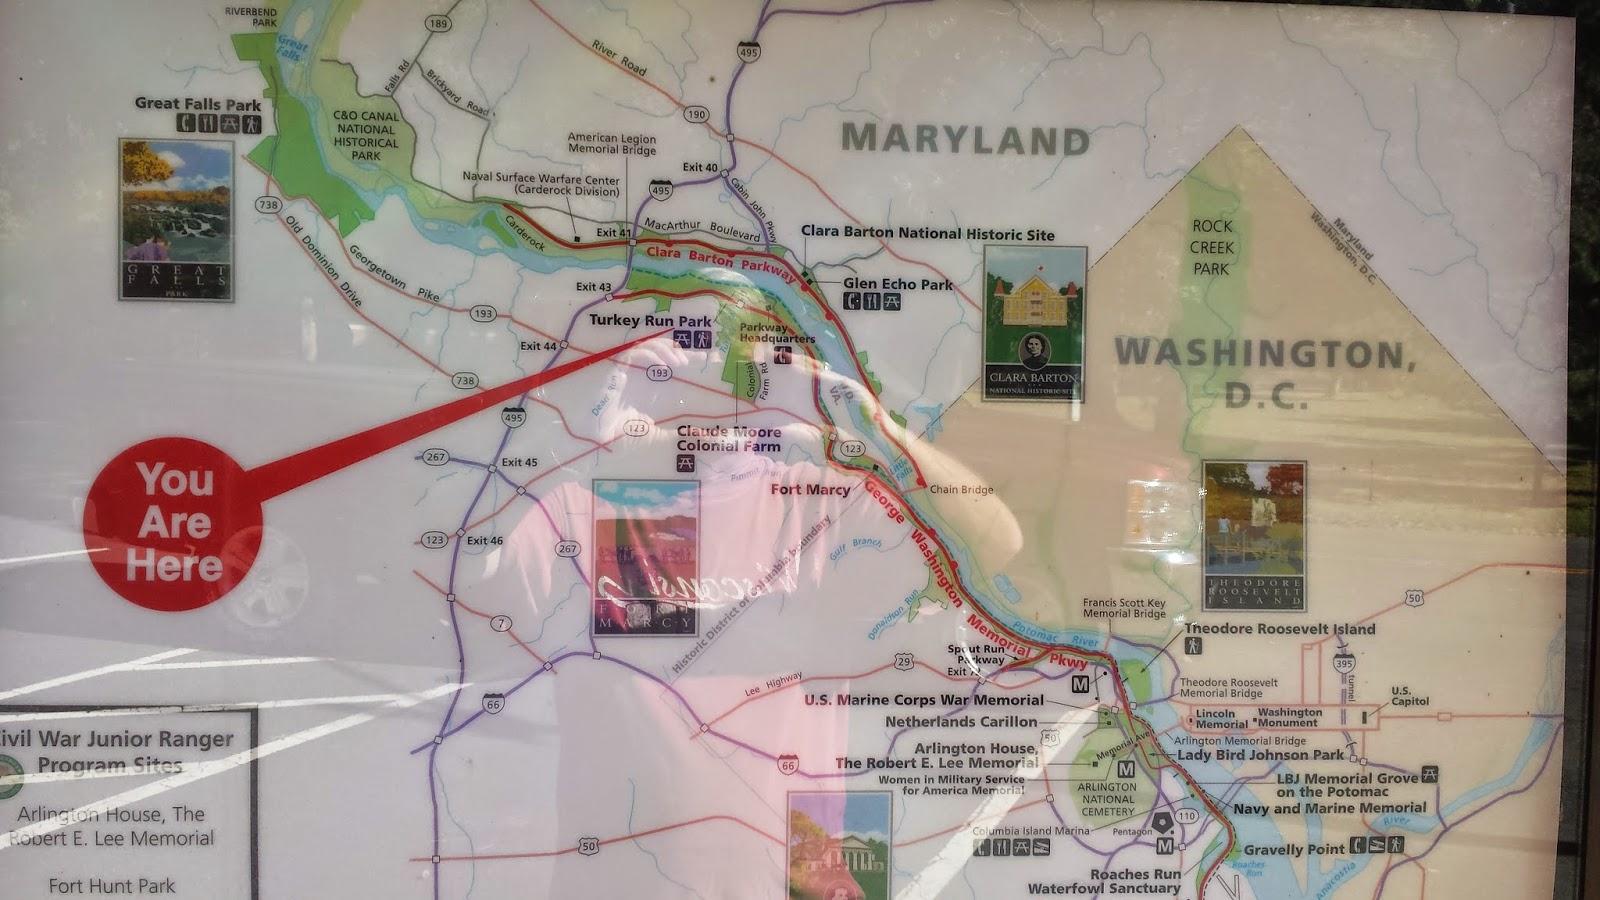 map george washington memorial parkway